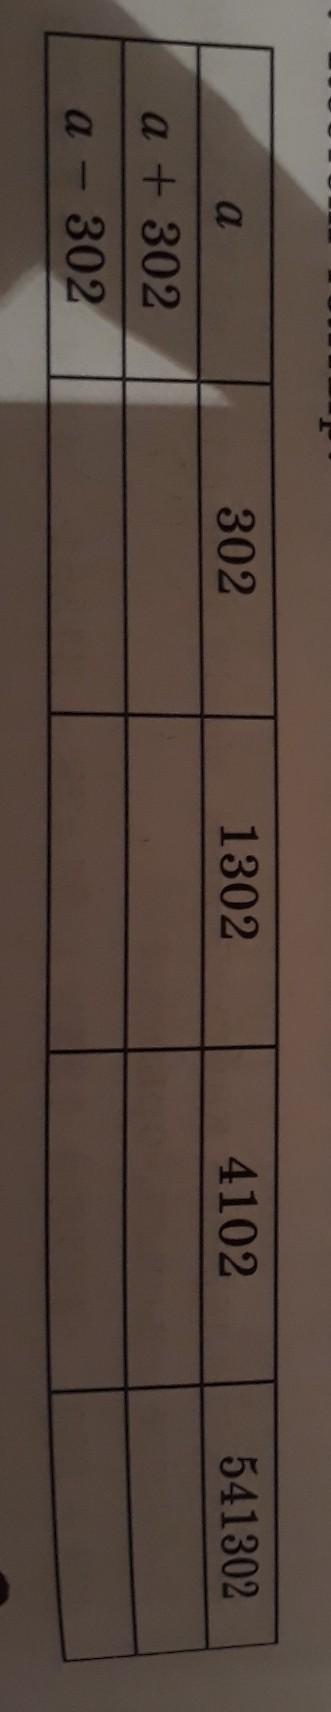 Математика 4-клас 66бет,5есеп